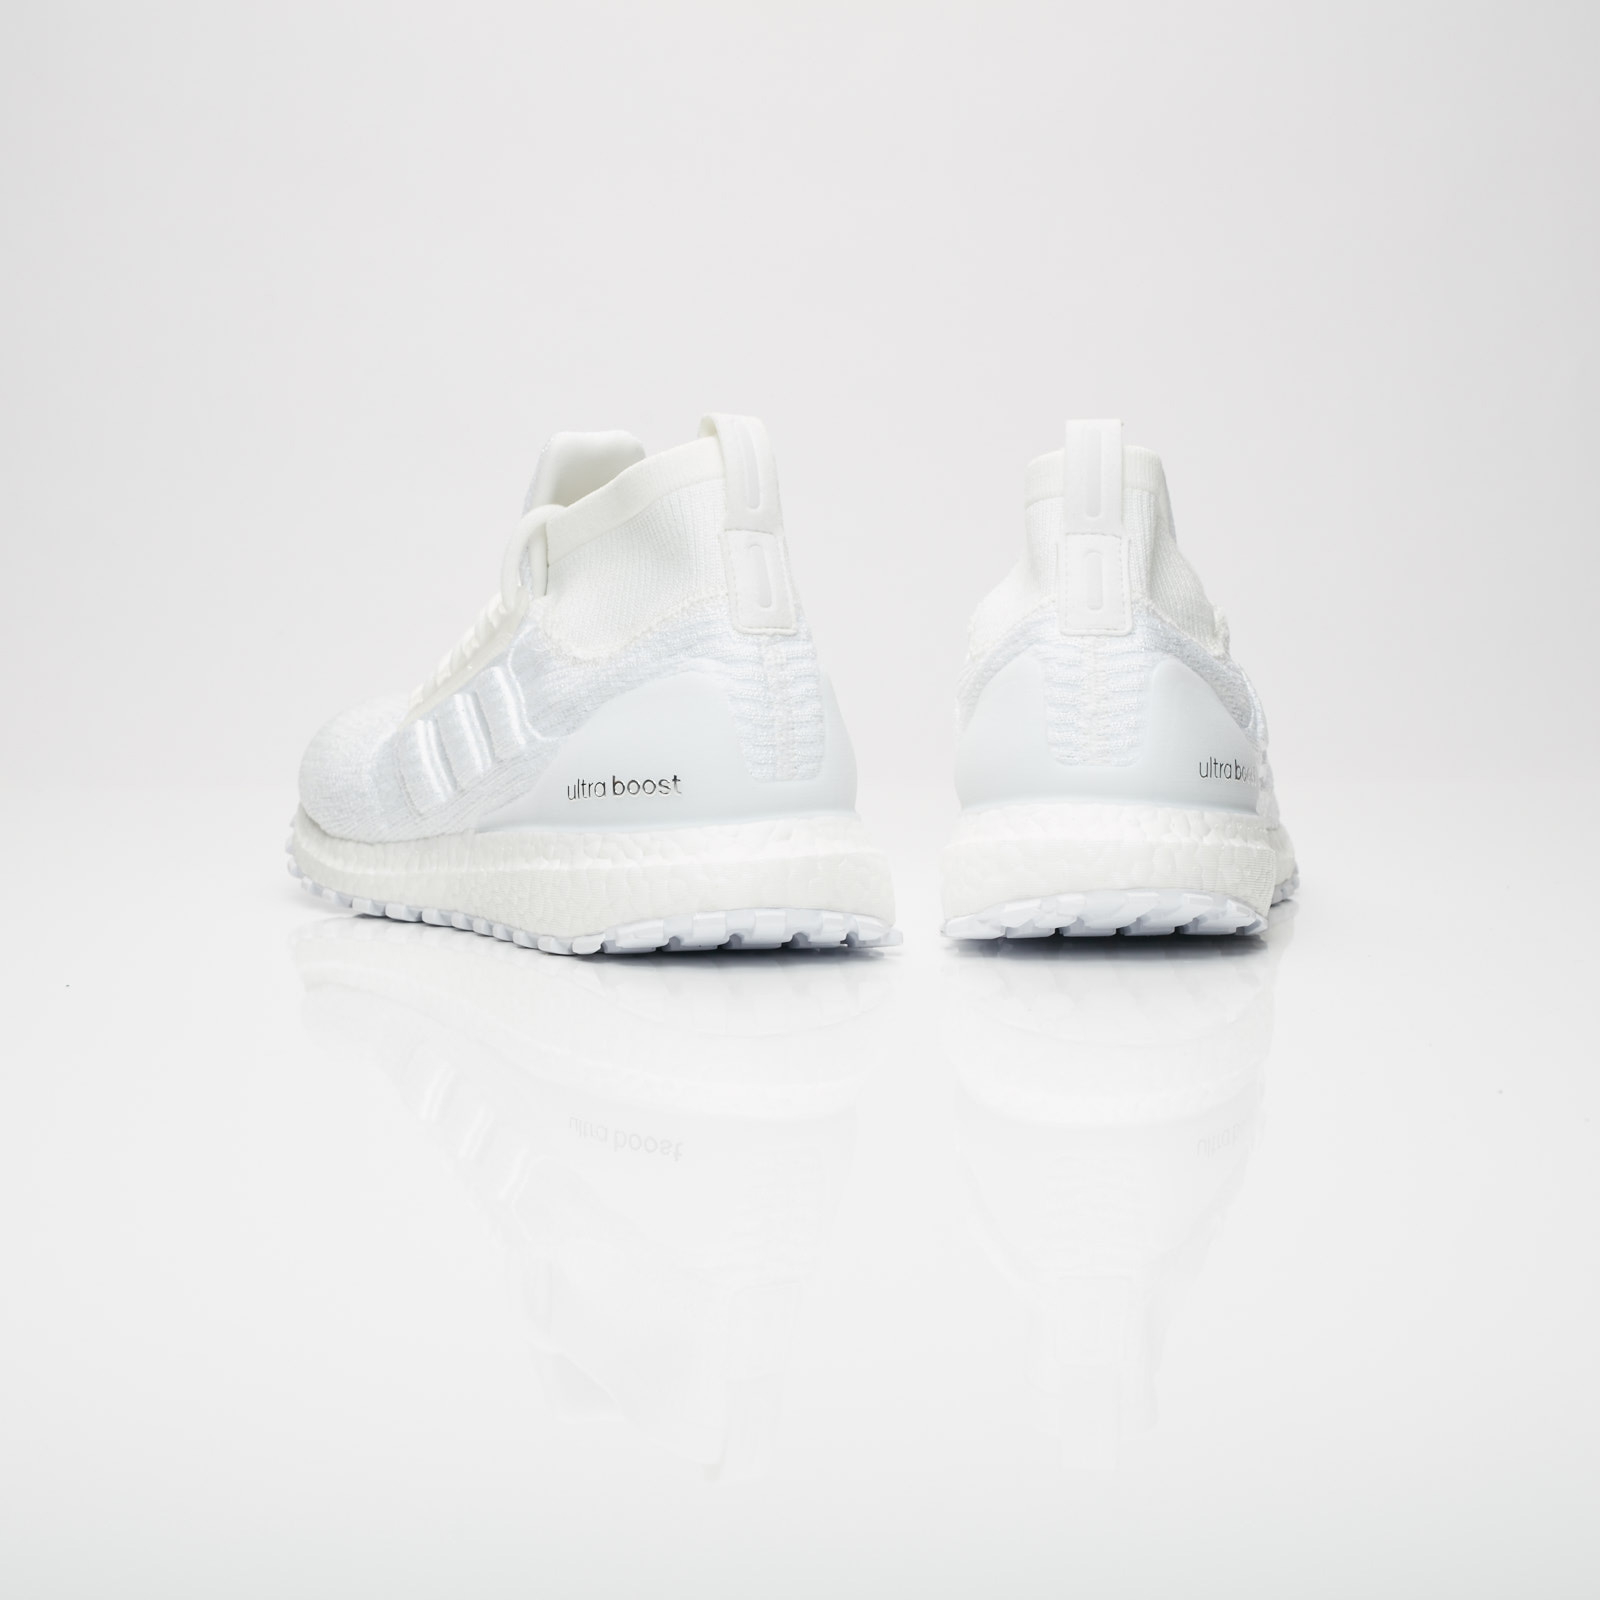 low priced 31764 aa8a6 adidas UltraBOOST All Terrain - Bb6131 - Sneakersnstuff ...